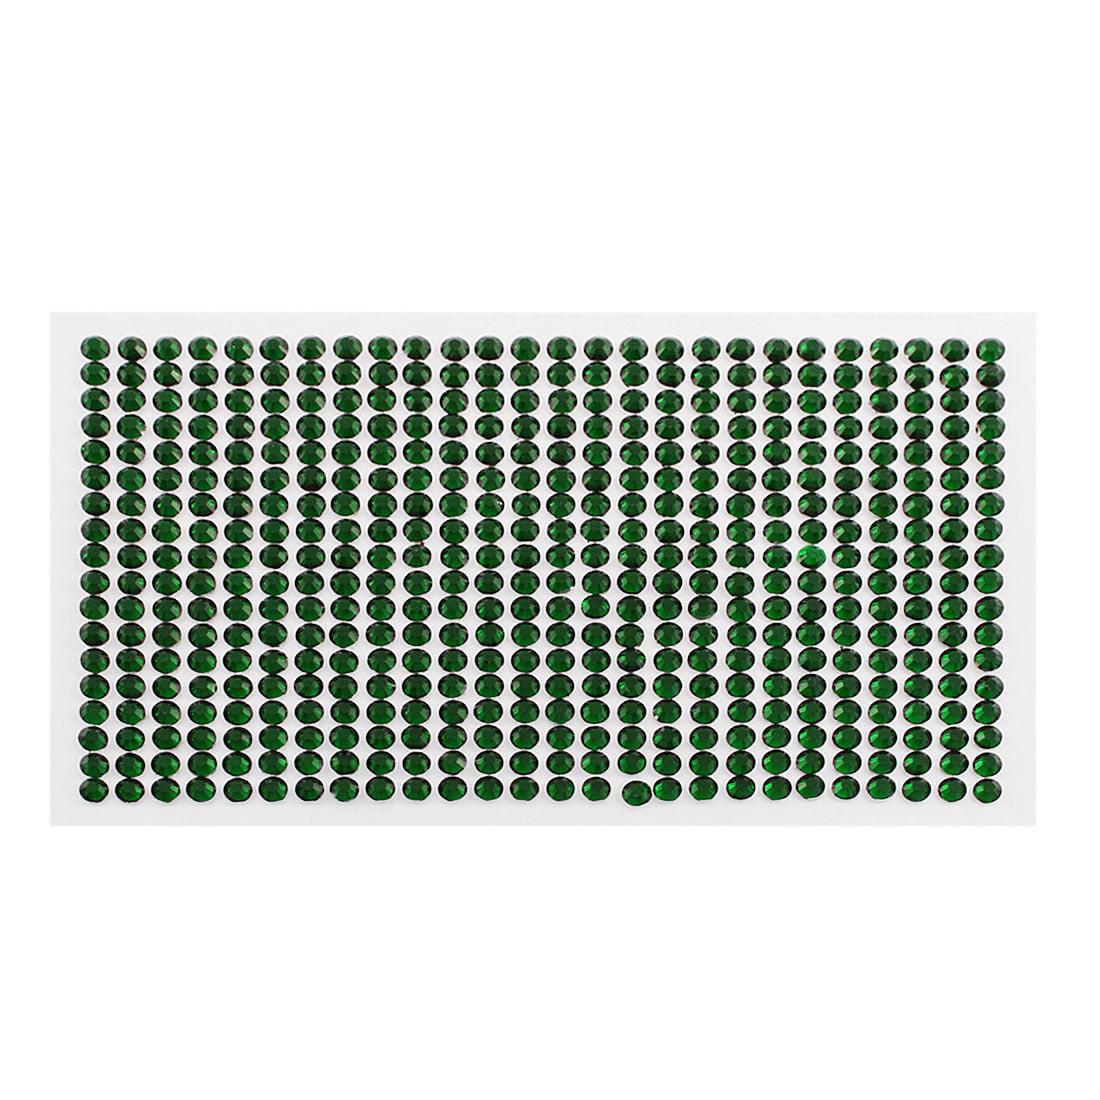 5mm Round Self Adhesive Sparkly Crystal Rhinestone DIY Stickers Green